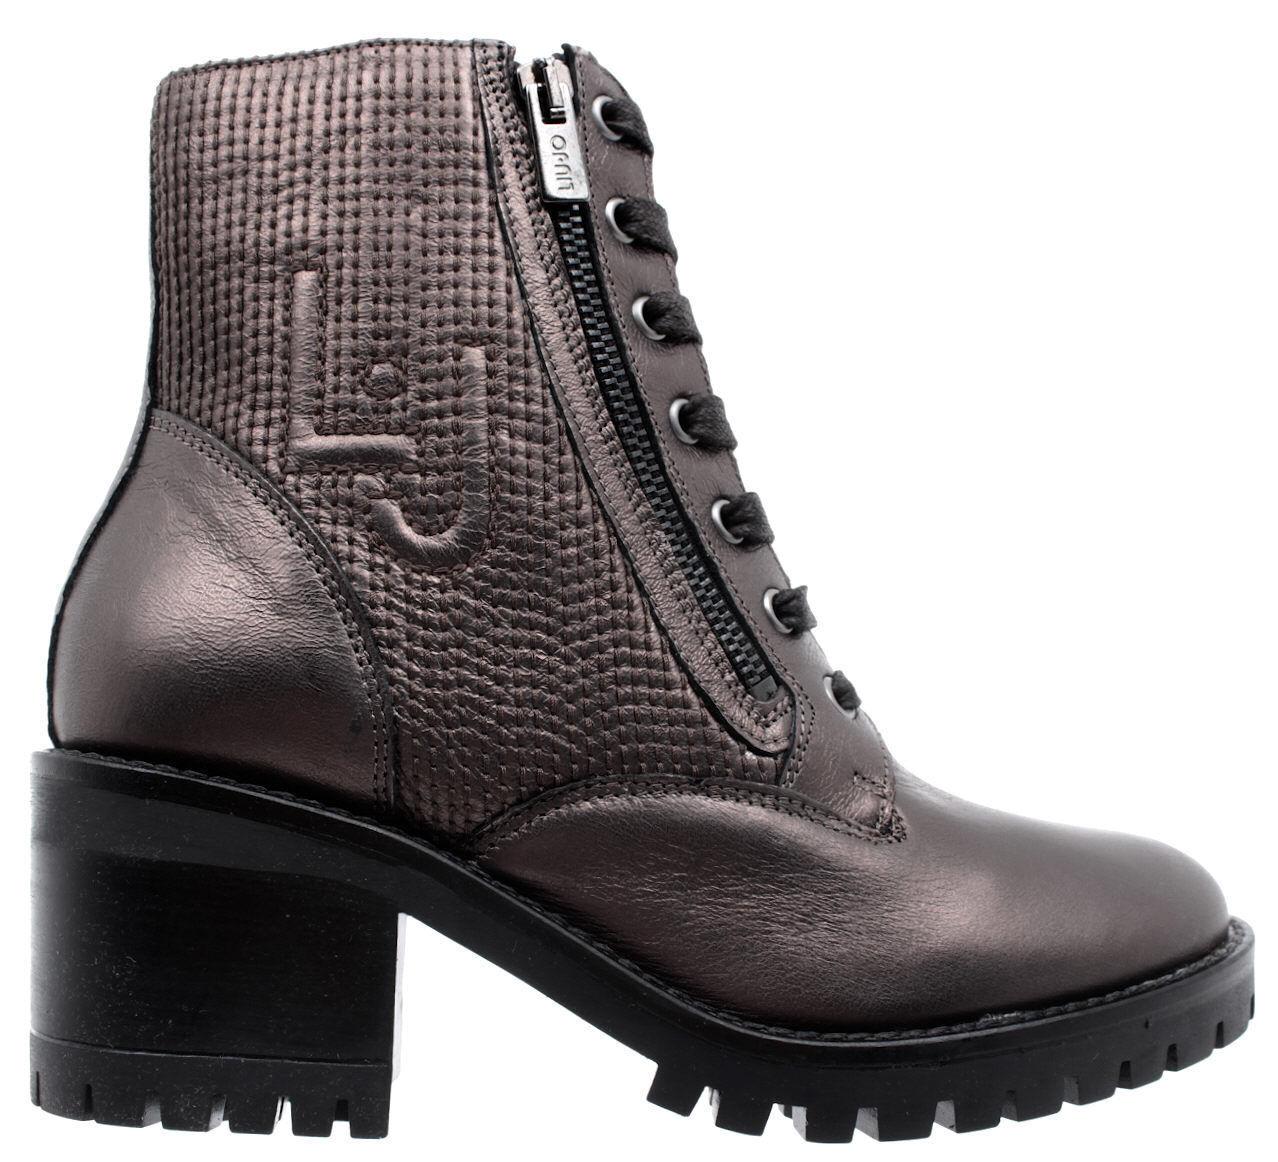 LIU JO Damen Stiefeletten Schuhe Tina 01 Lace Up Ebony Booty Foiled Calf Leder Ebony Up 6da7ca